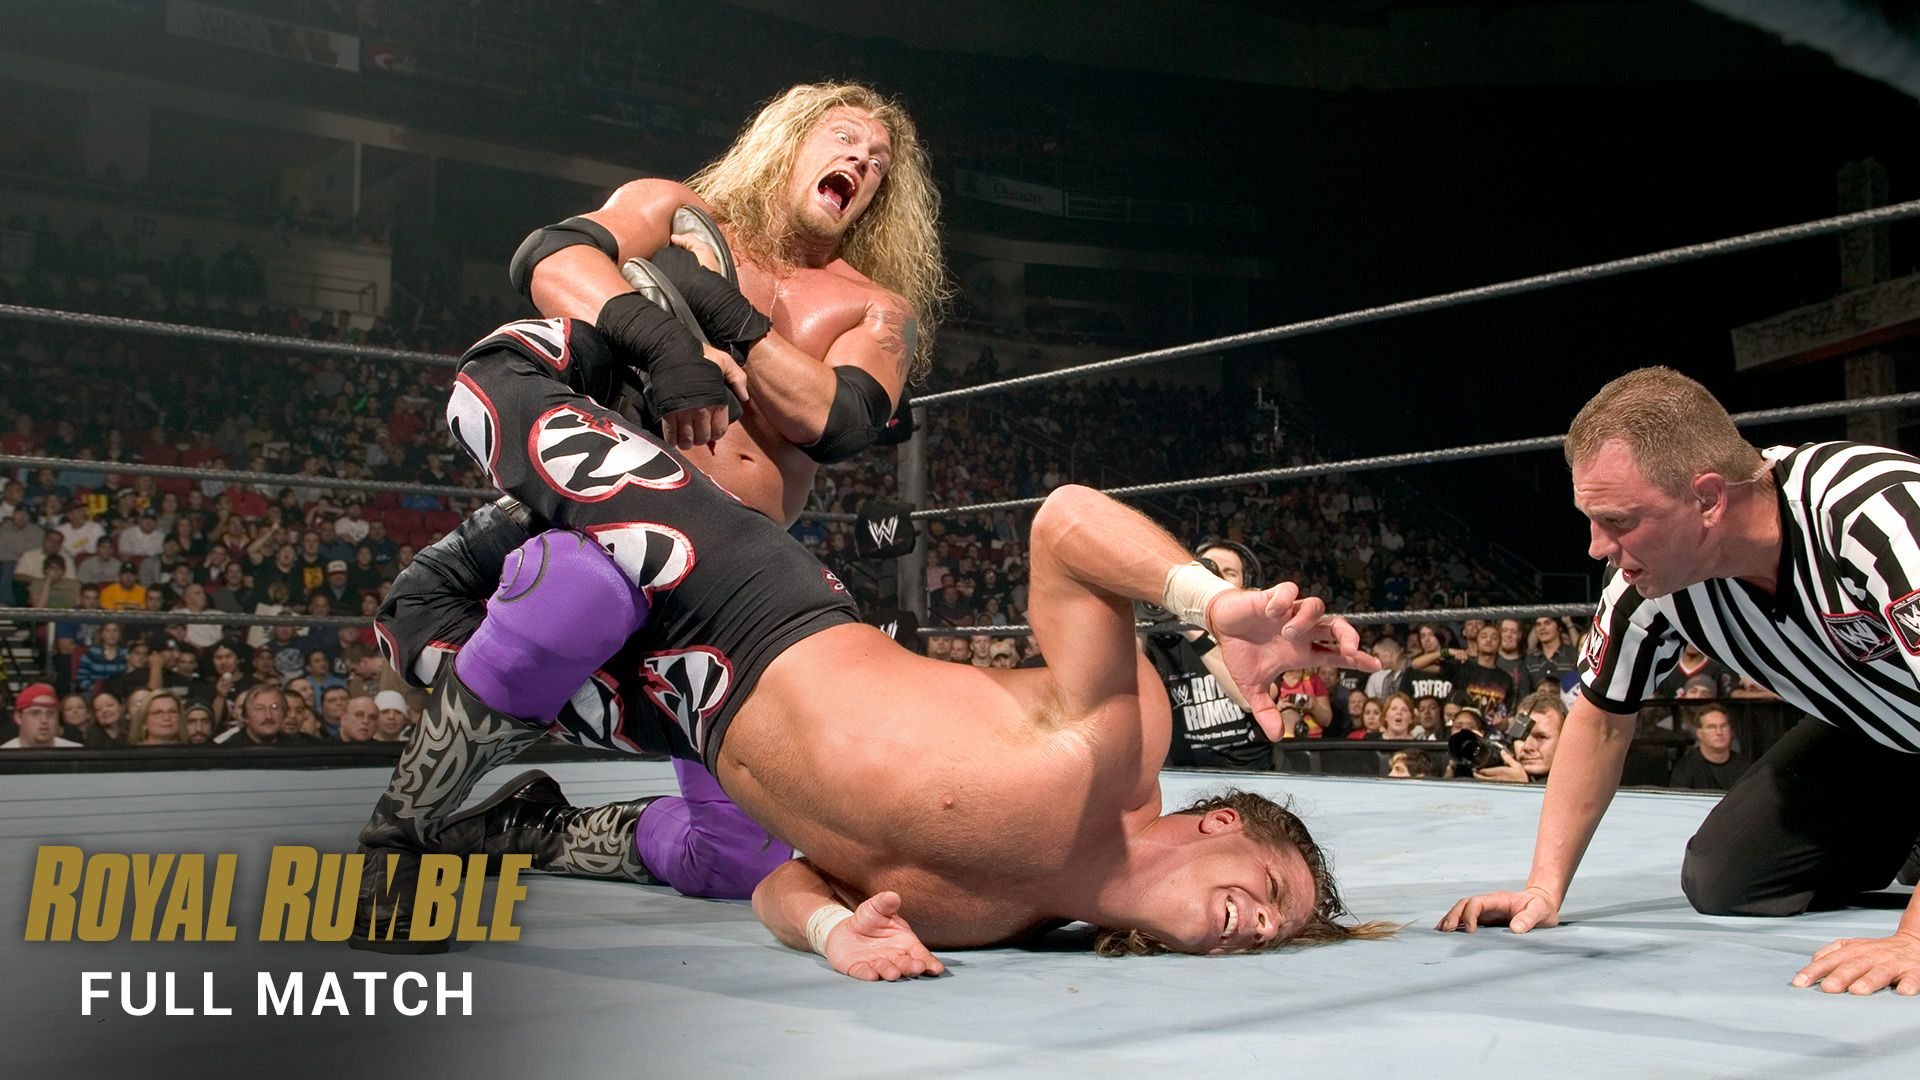 Resultado de imagem para edge vs shawn michaels royal rumble 2005